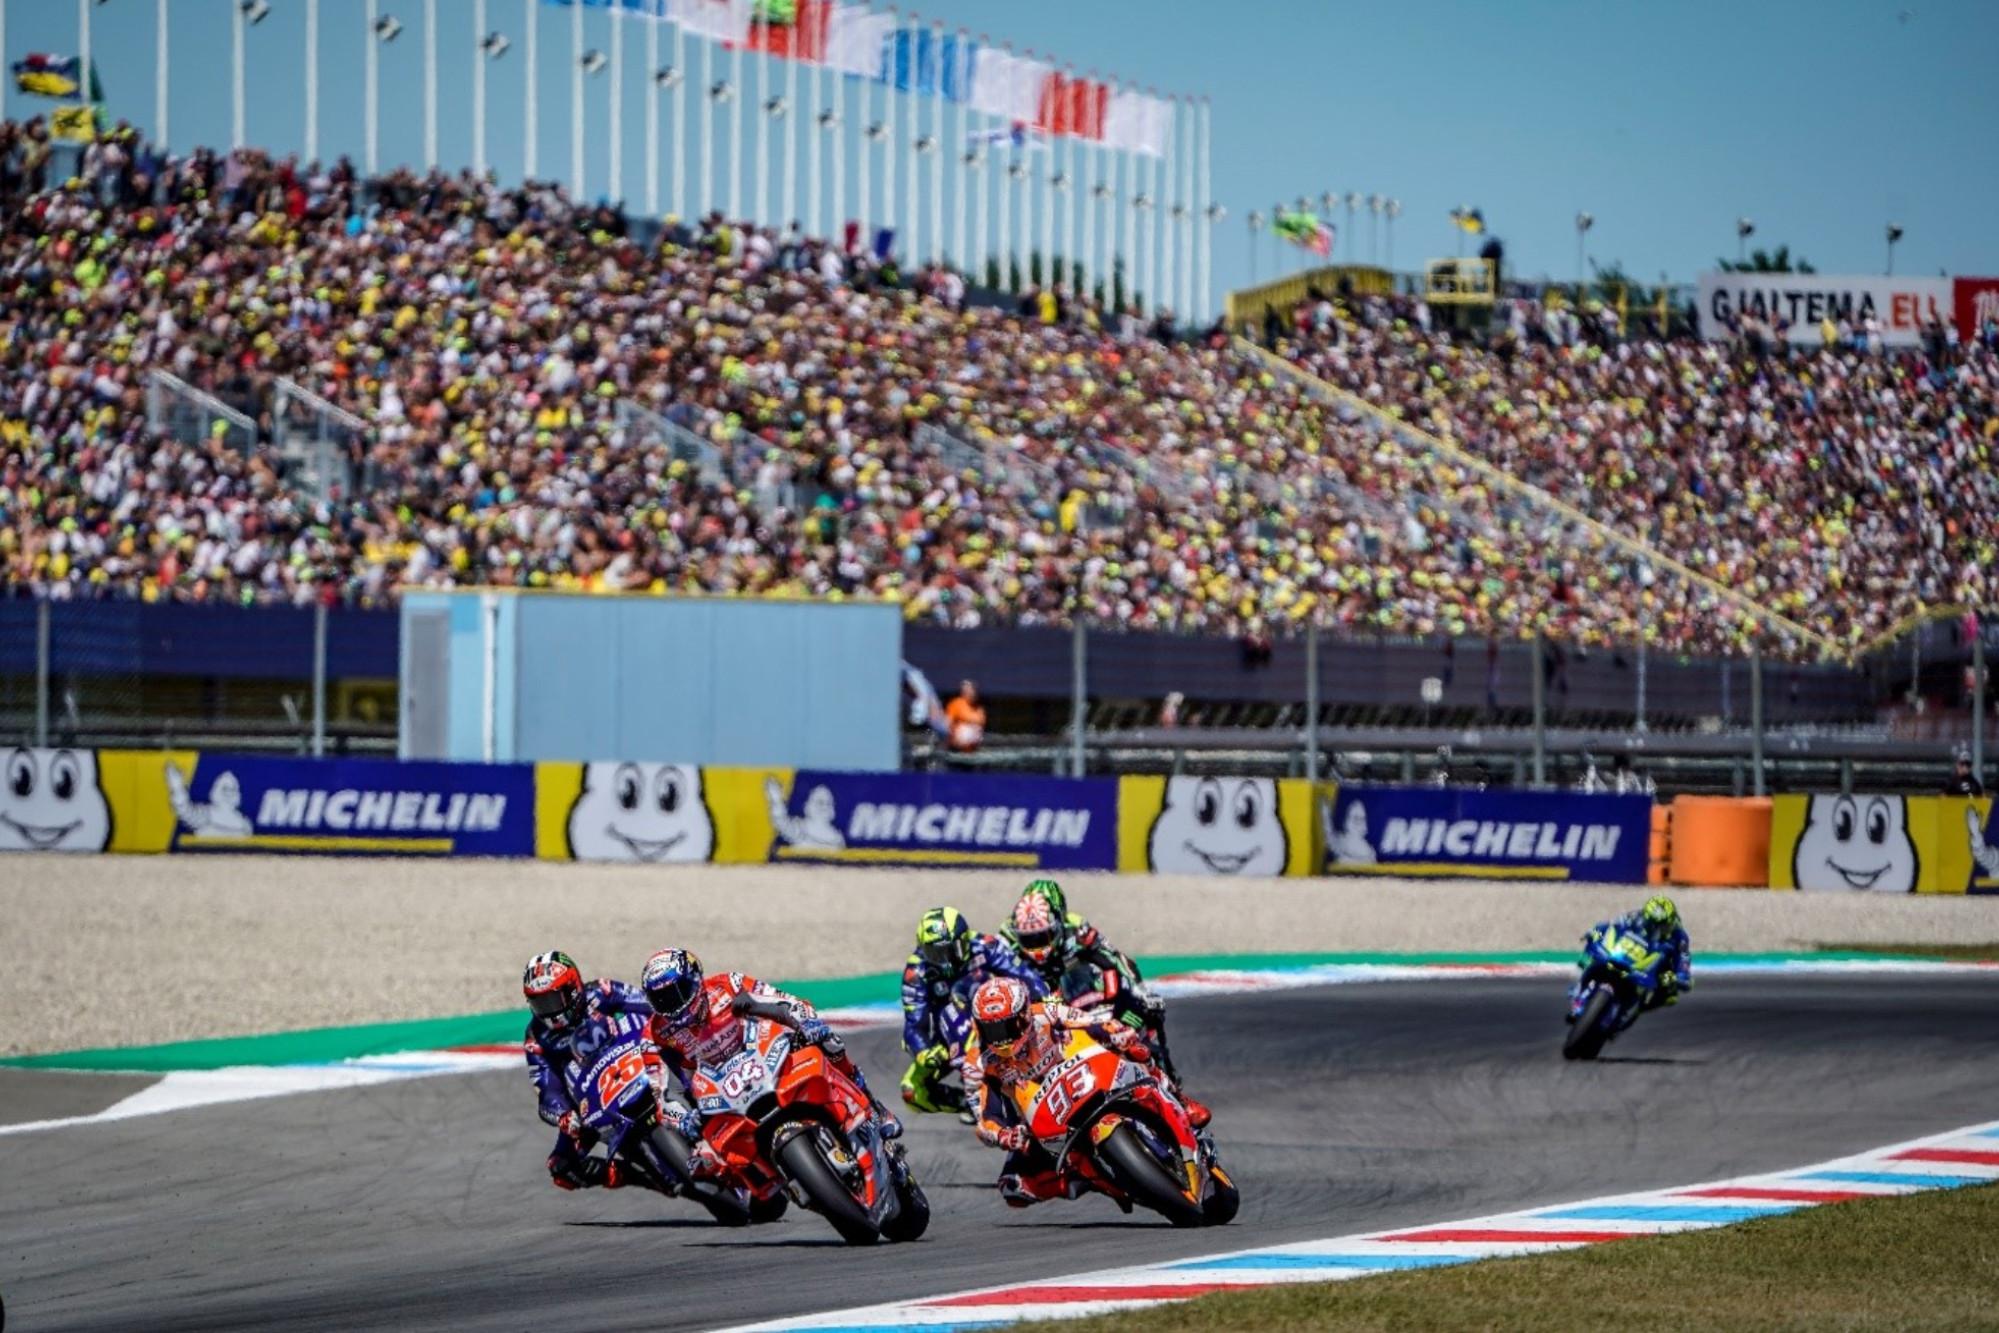 MotoGP: The Fight!